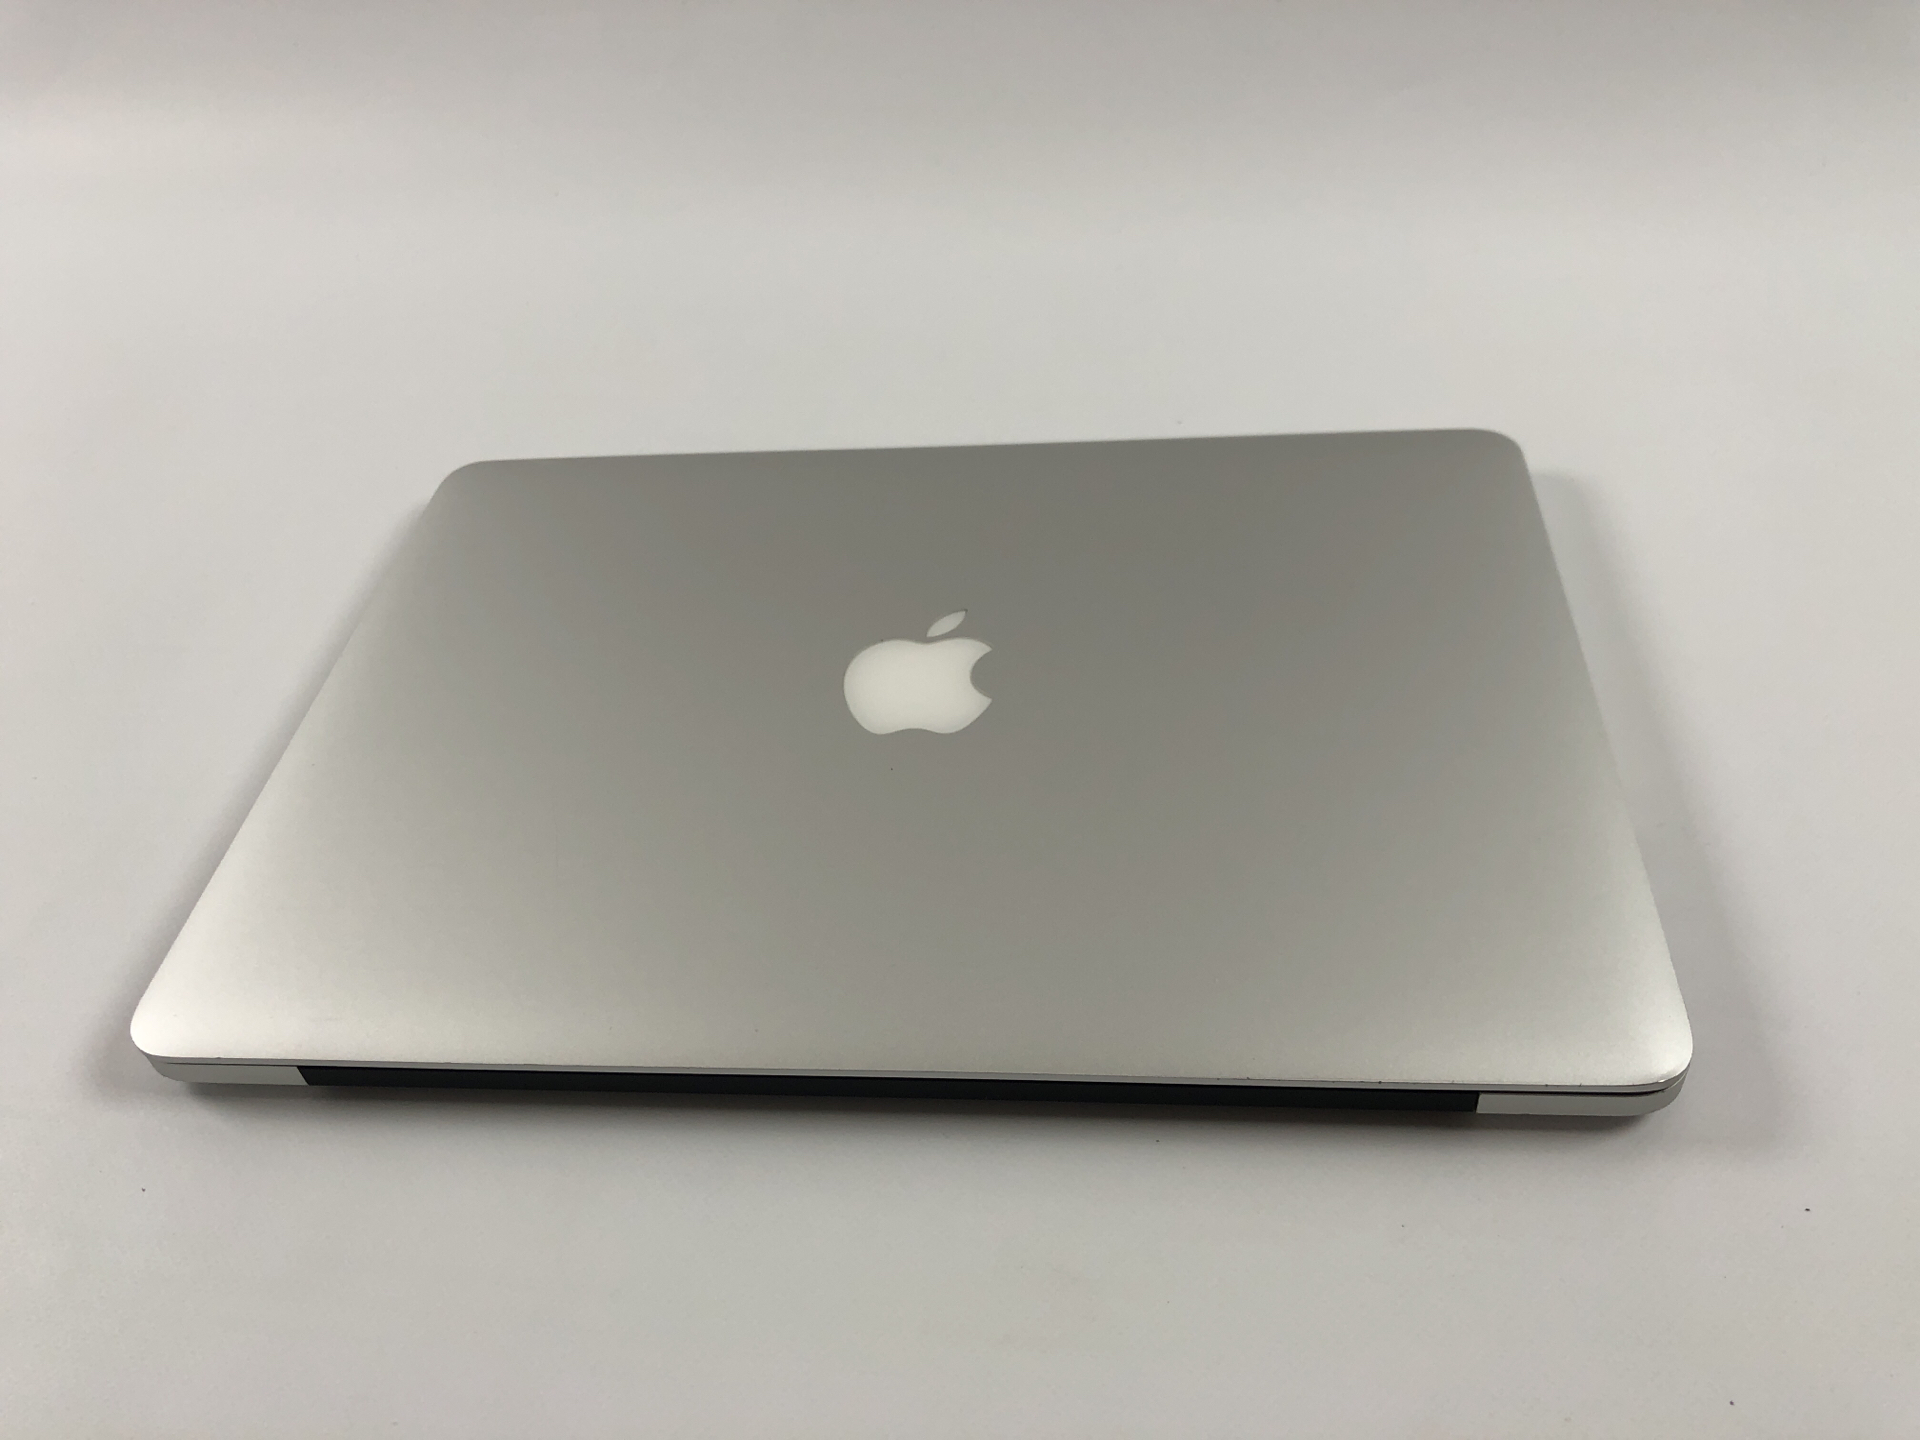 "MacBook Pro Retina 13"" Early 2015 (Intel Core i5 2.9 GHz 8 GB RAM 512 GB SSD), Intel Core i5 2.9 GHz, 8 GB RAM, 512 GB SSD, bild 3"